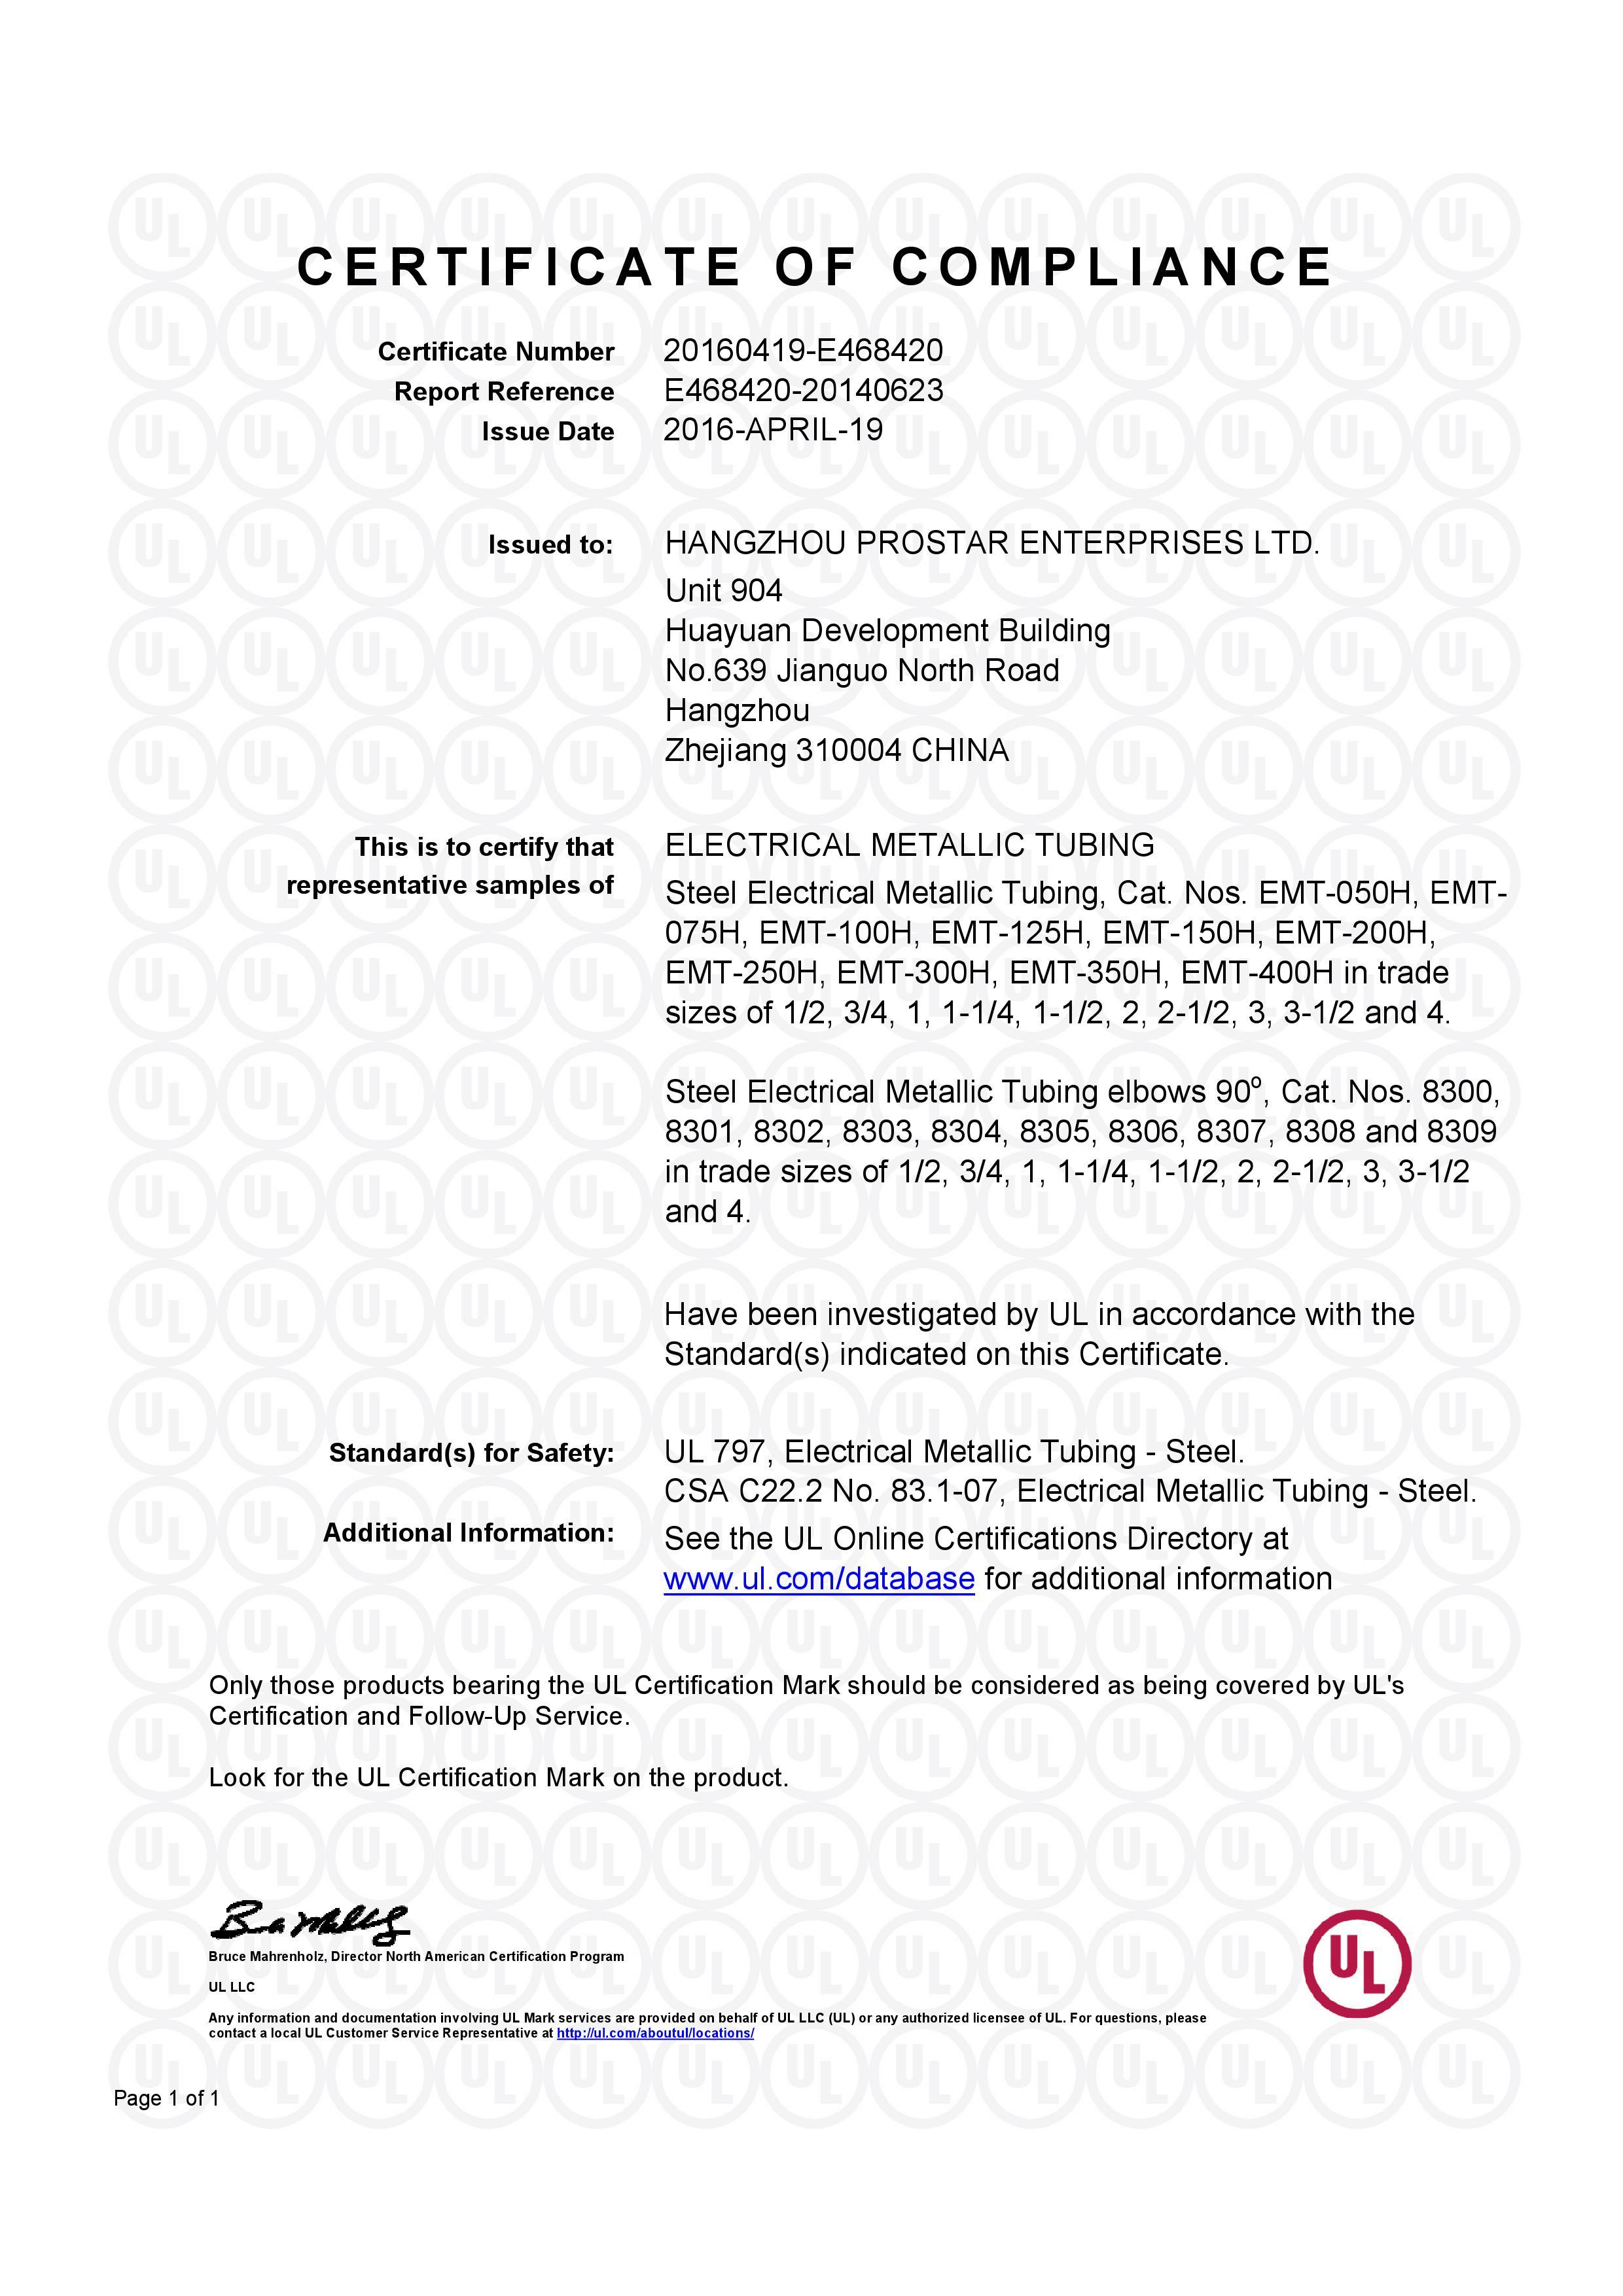 Hangzhou Prostar Enterprises Ltd. - Electrical conduit and fittings